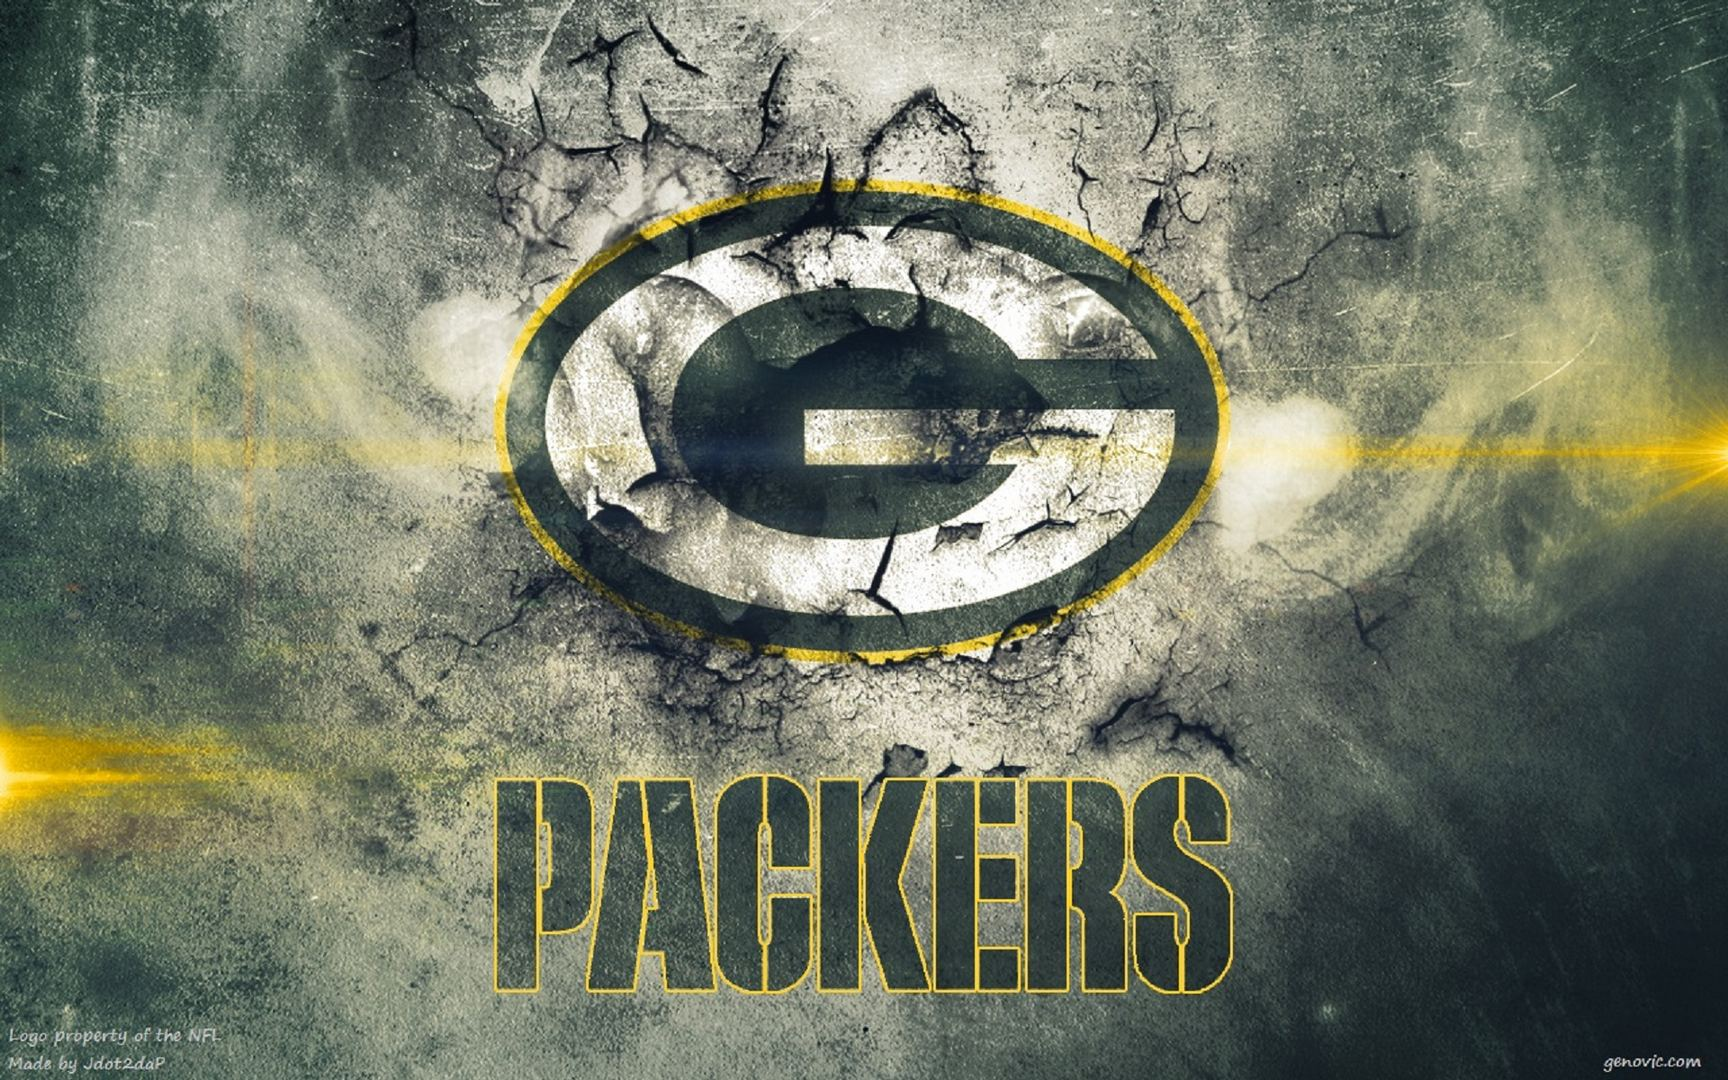 Green Bay Packers wallpaper hd download 1728x1080